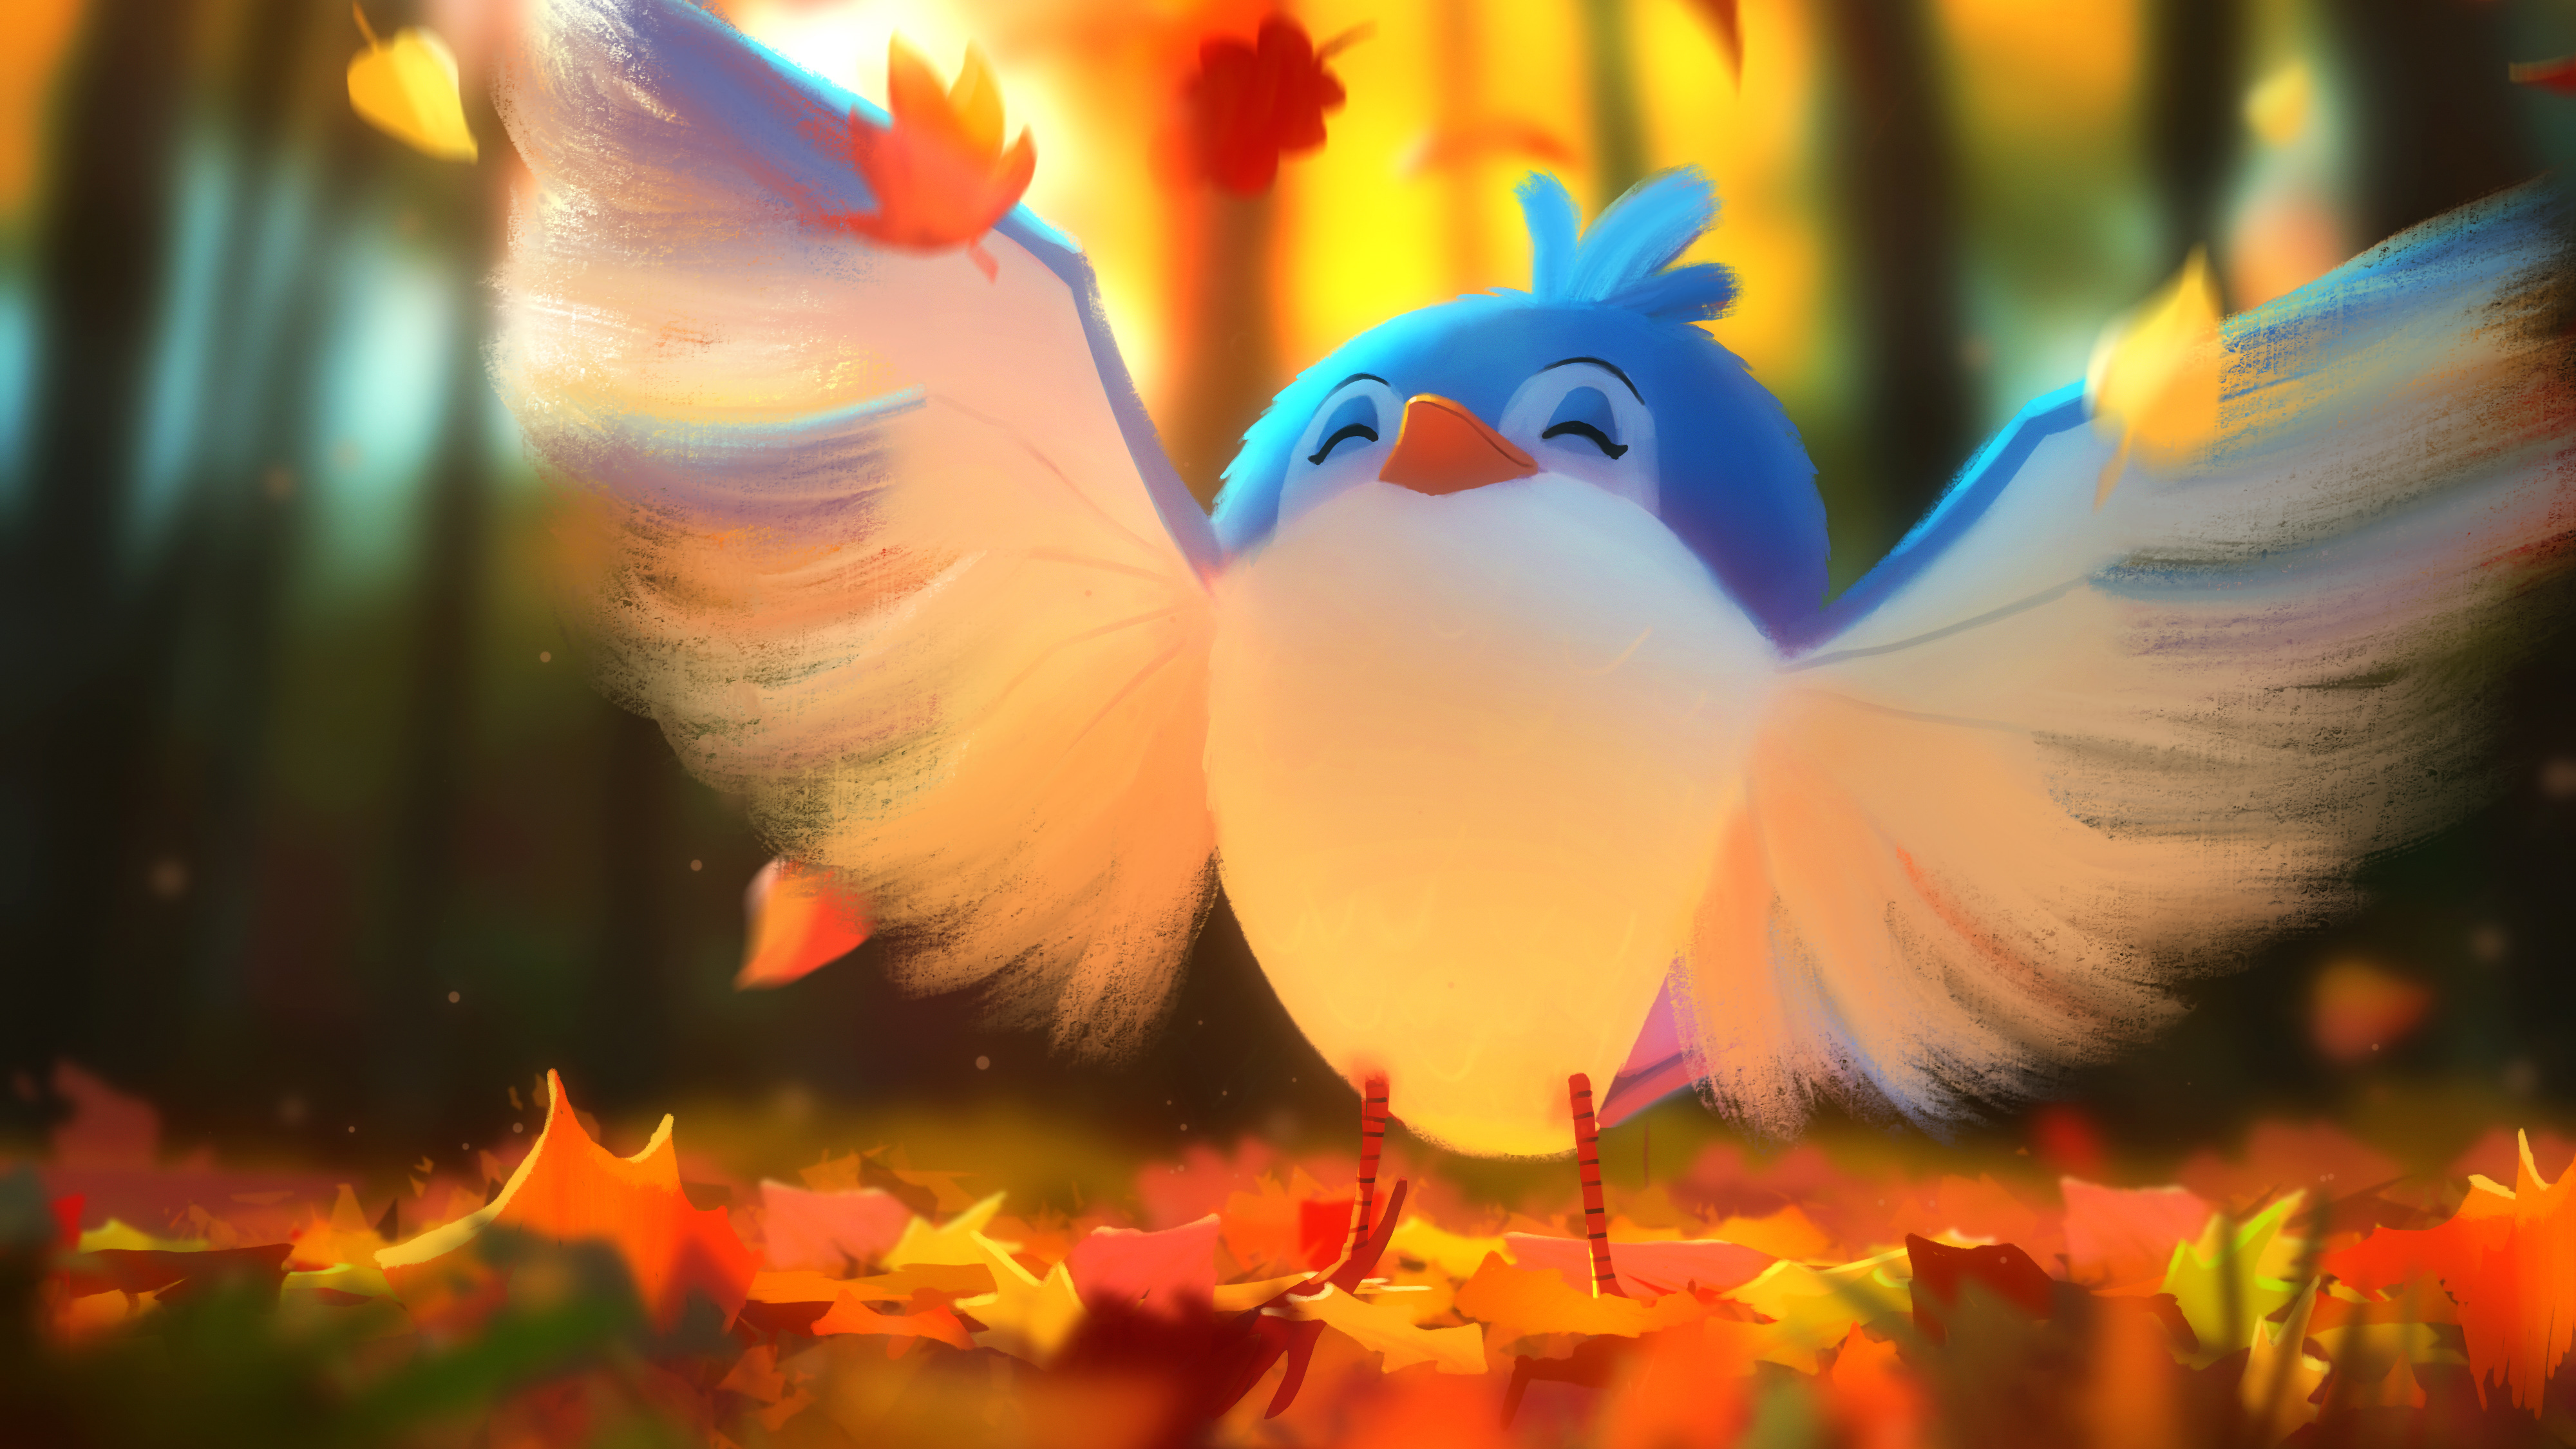 Cute Bird Digital Art 4k Hd Wallpapers   Procreate App 853019 4000x2250